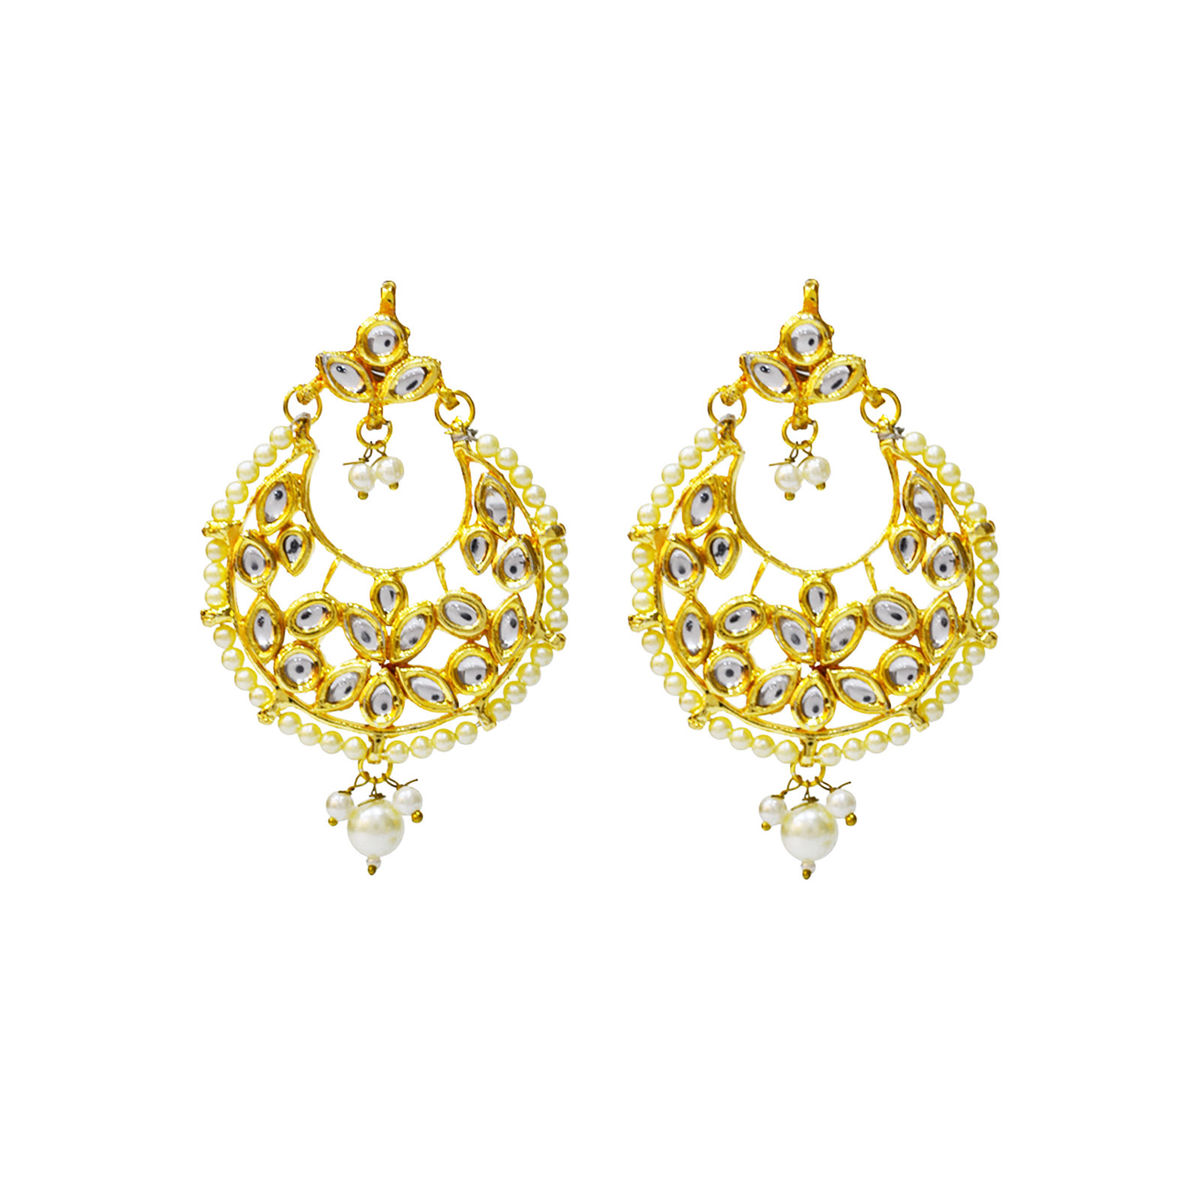 Ethnic Kundan Brass Plated Alloy Chandbali Earrings